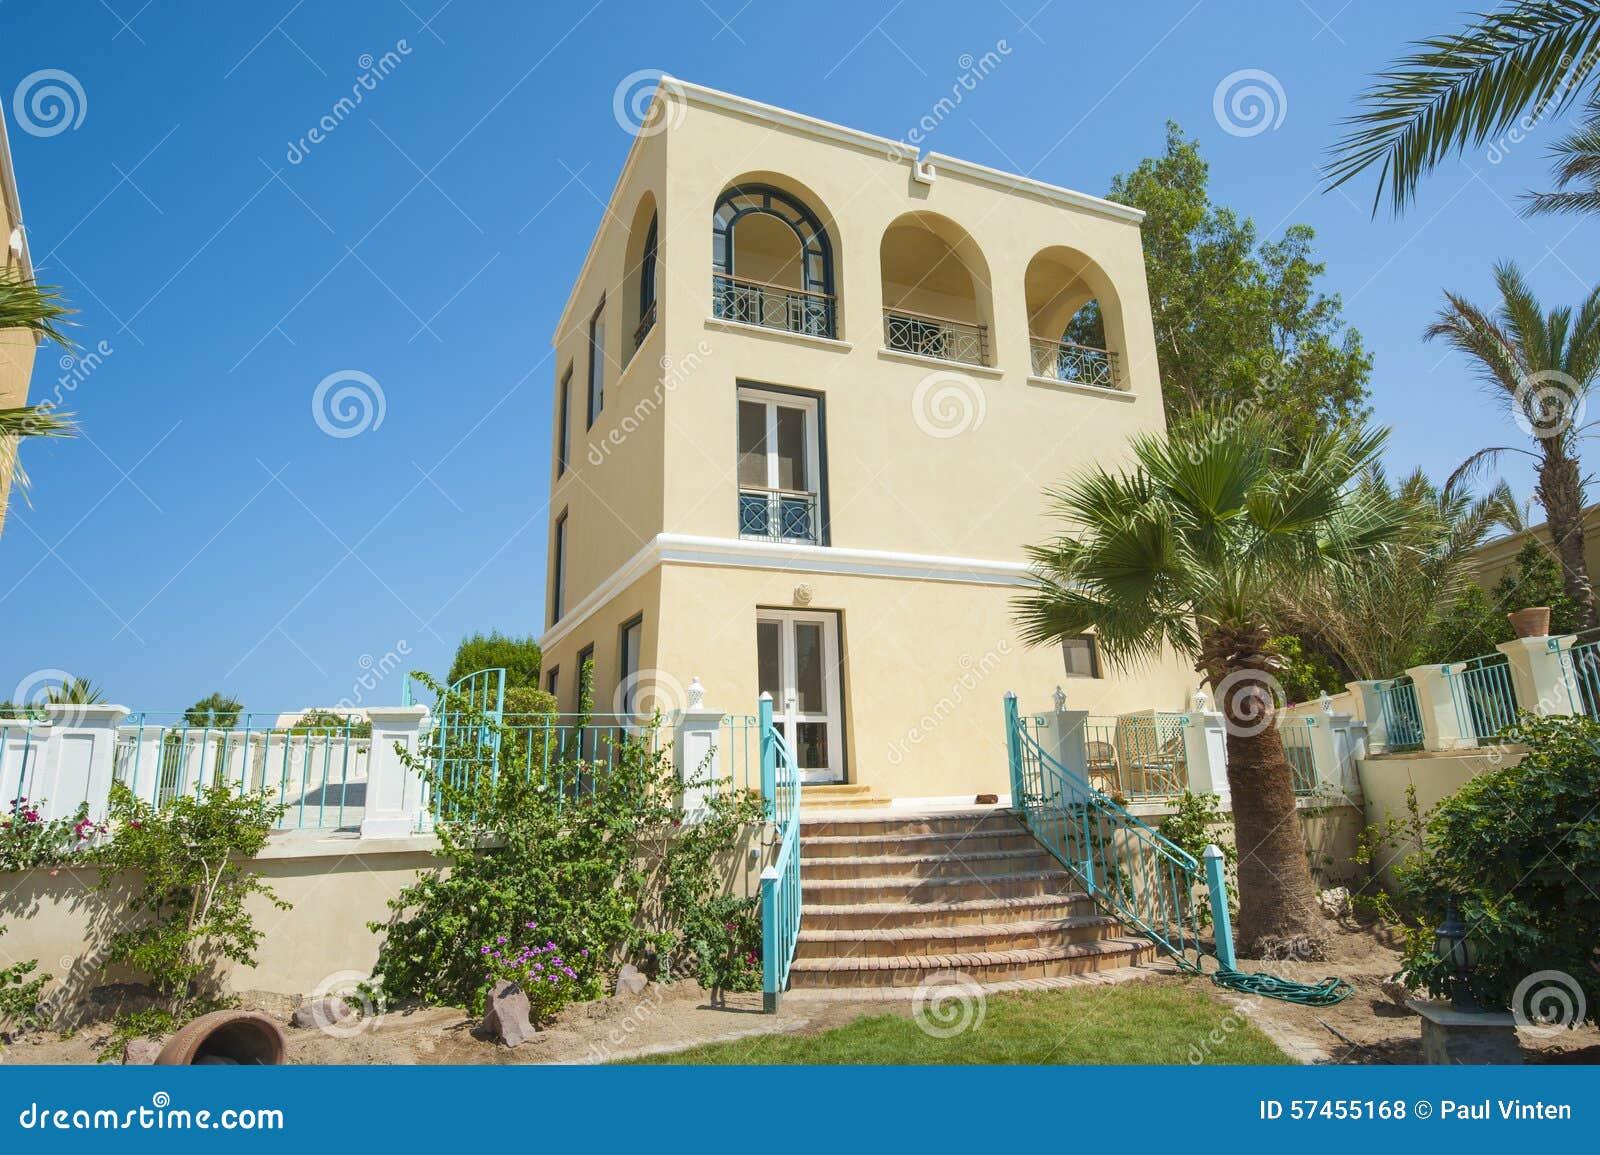 Luxury villa in a tropical resort